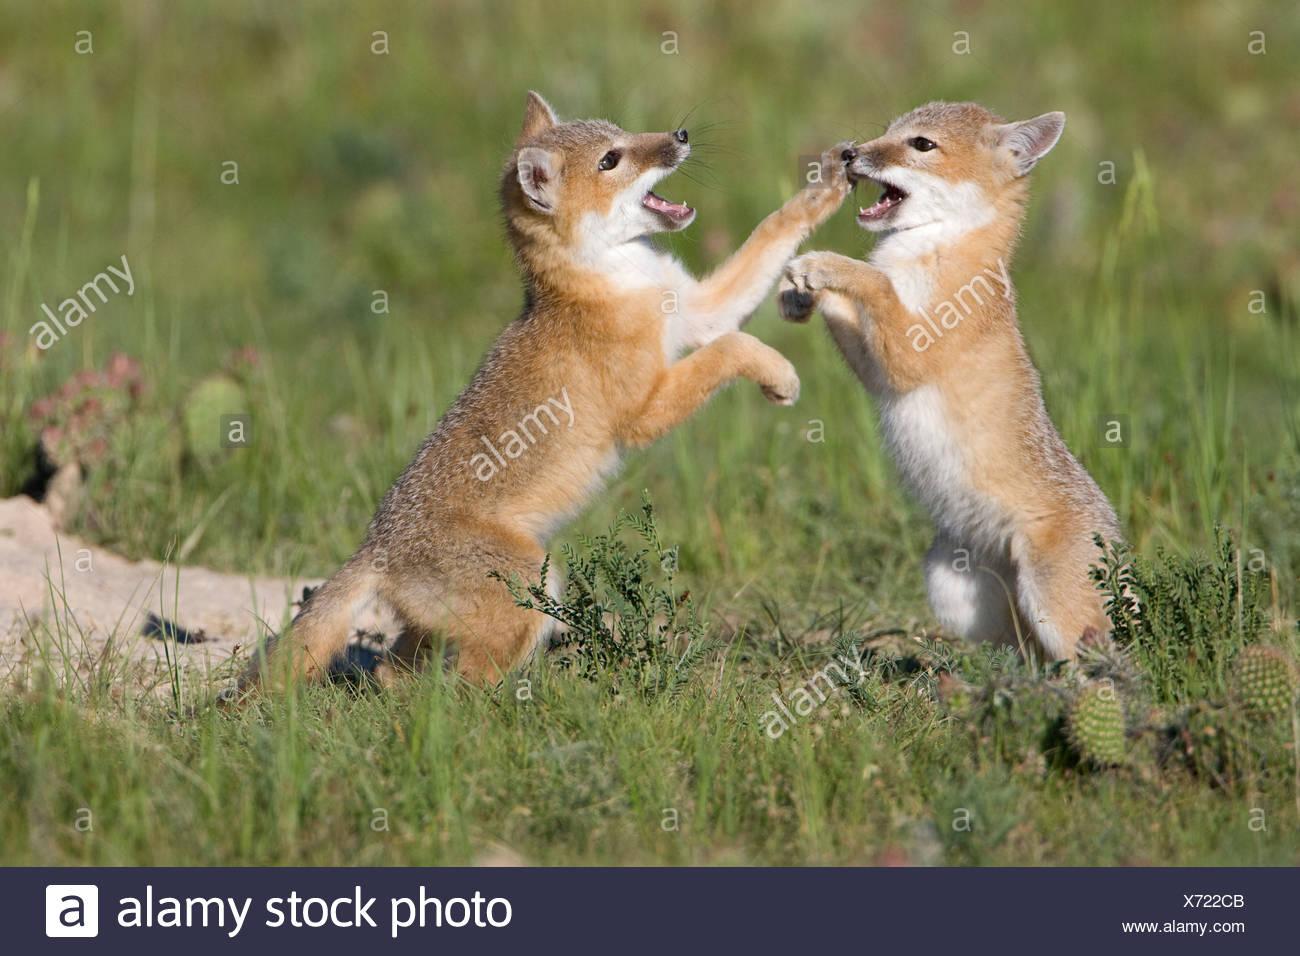 Swift fox (Vulpes velox), kits playing at den, near Pawnee National Grassland, Colorado. - Stock Image